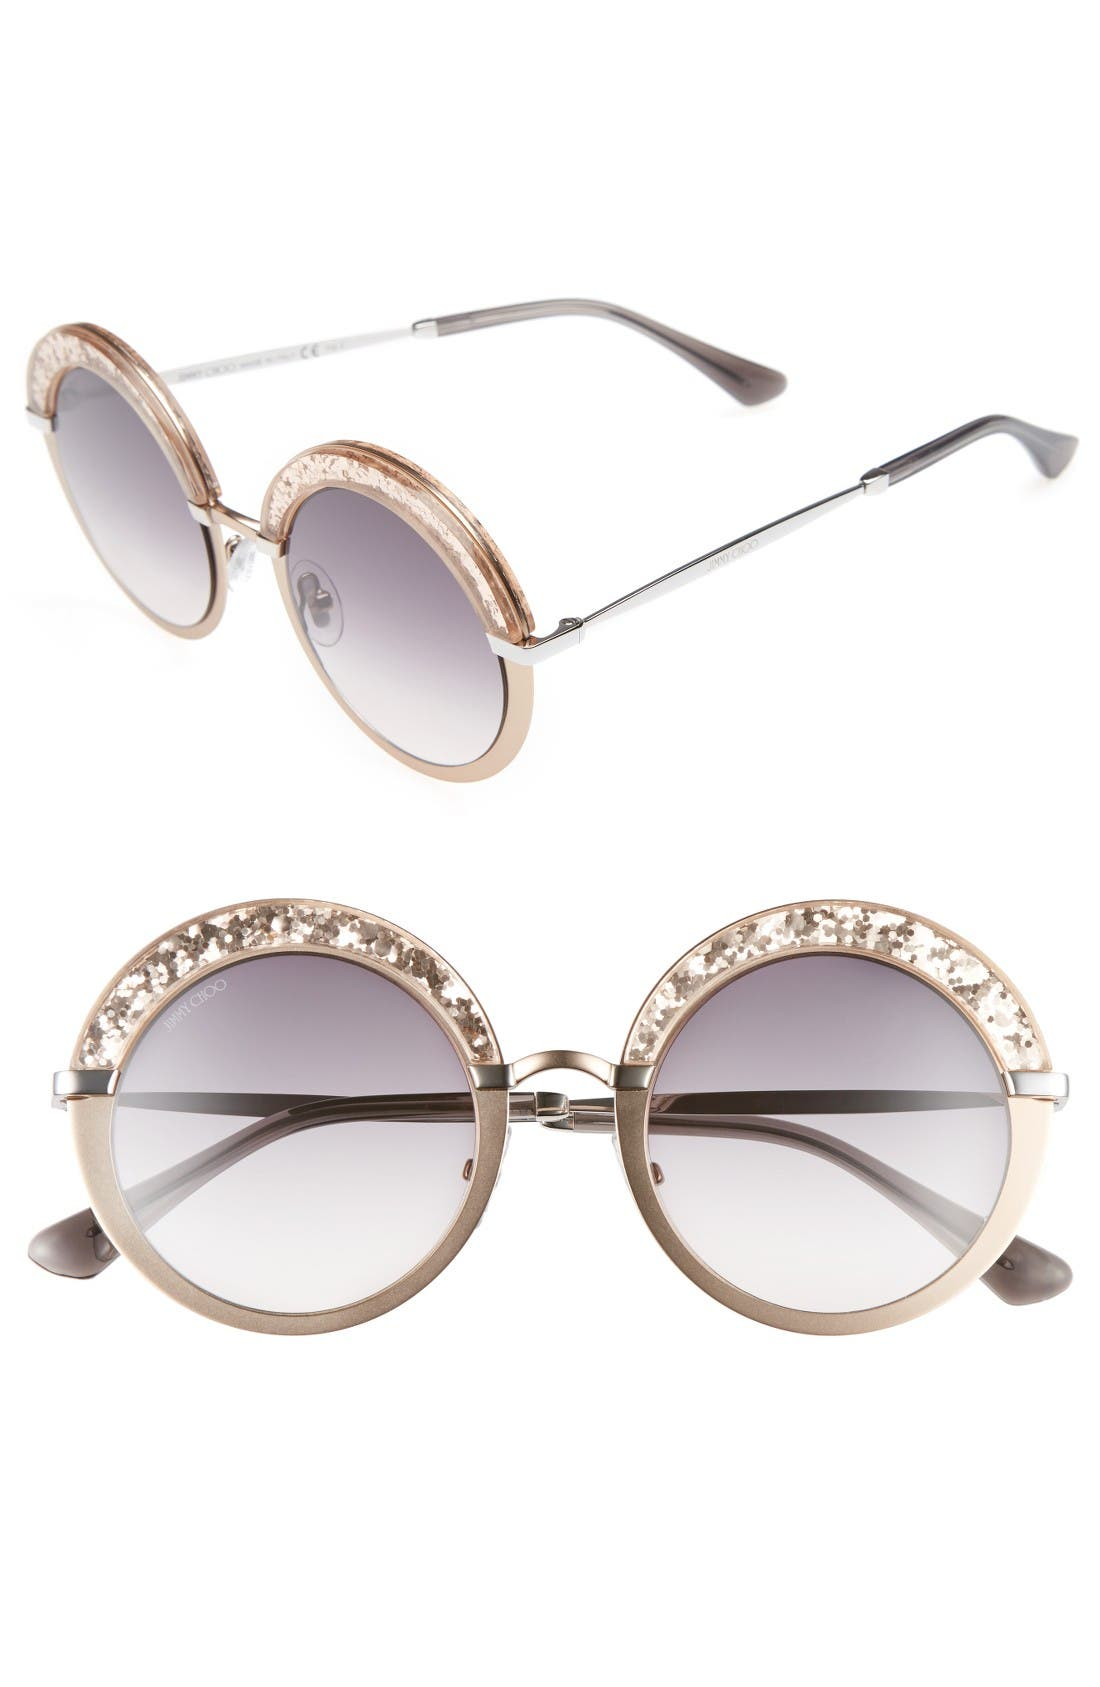 Jimmy Choo Gotha/S 50mm Round Sunglasses